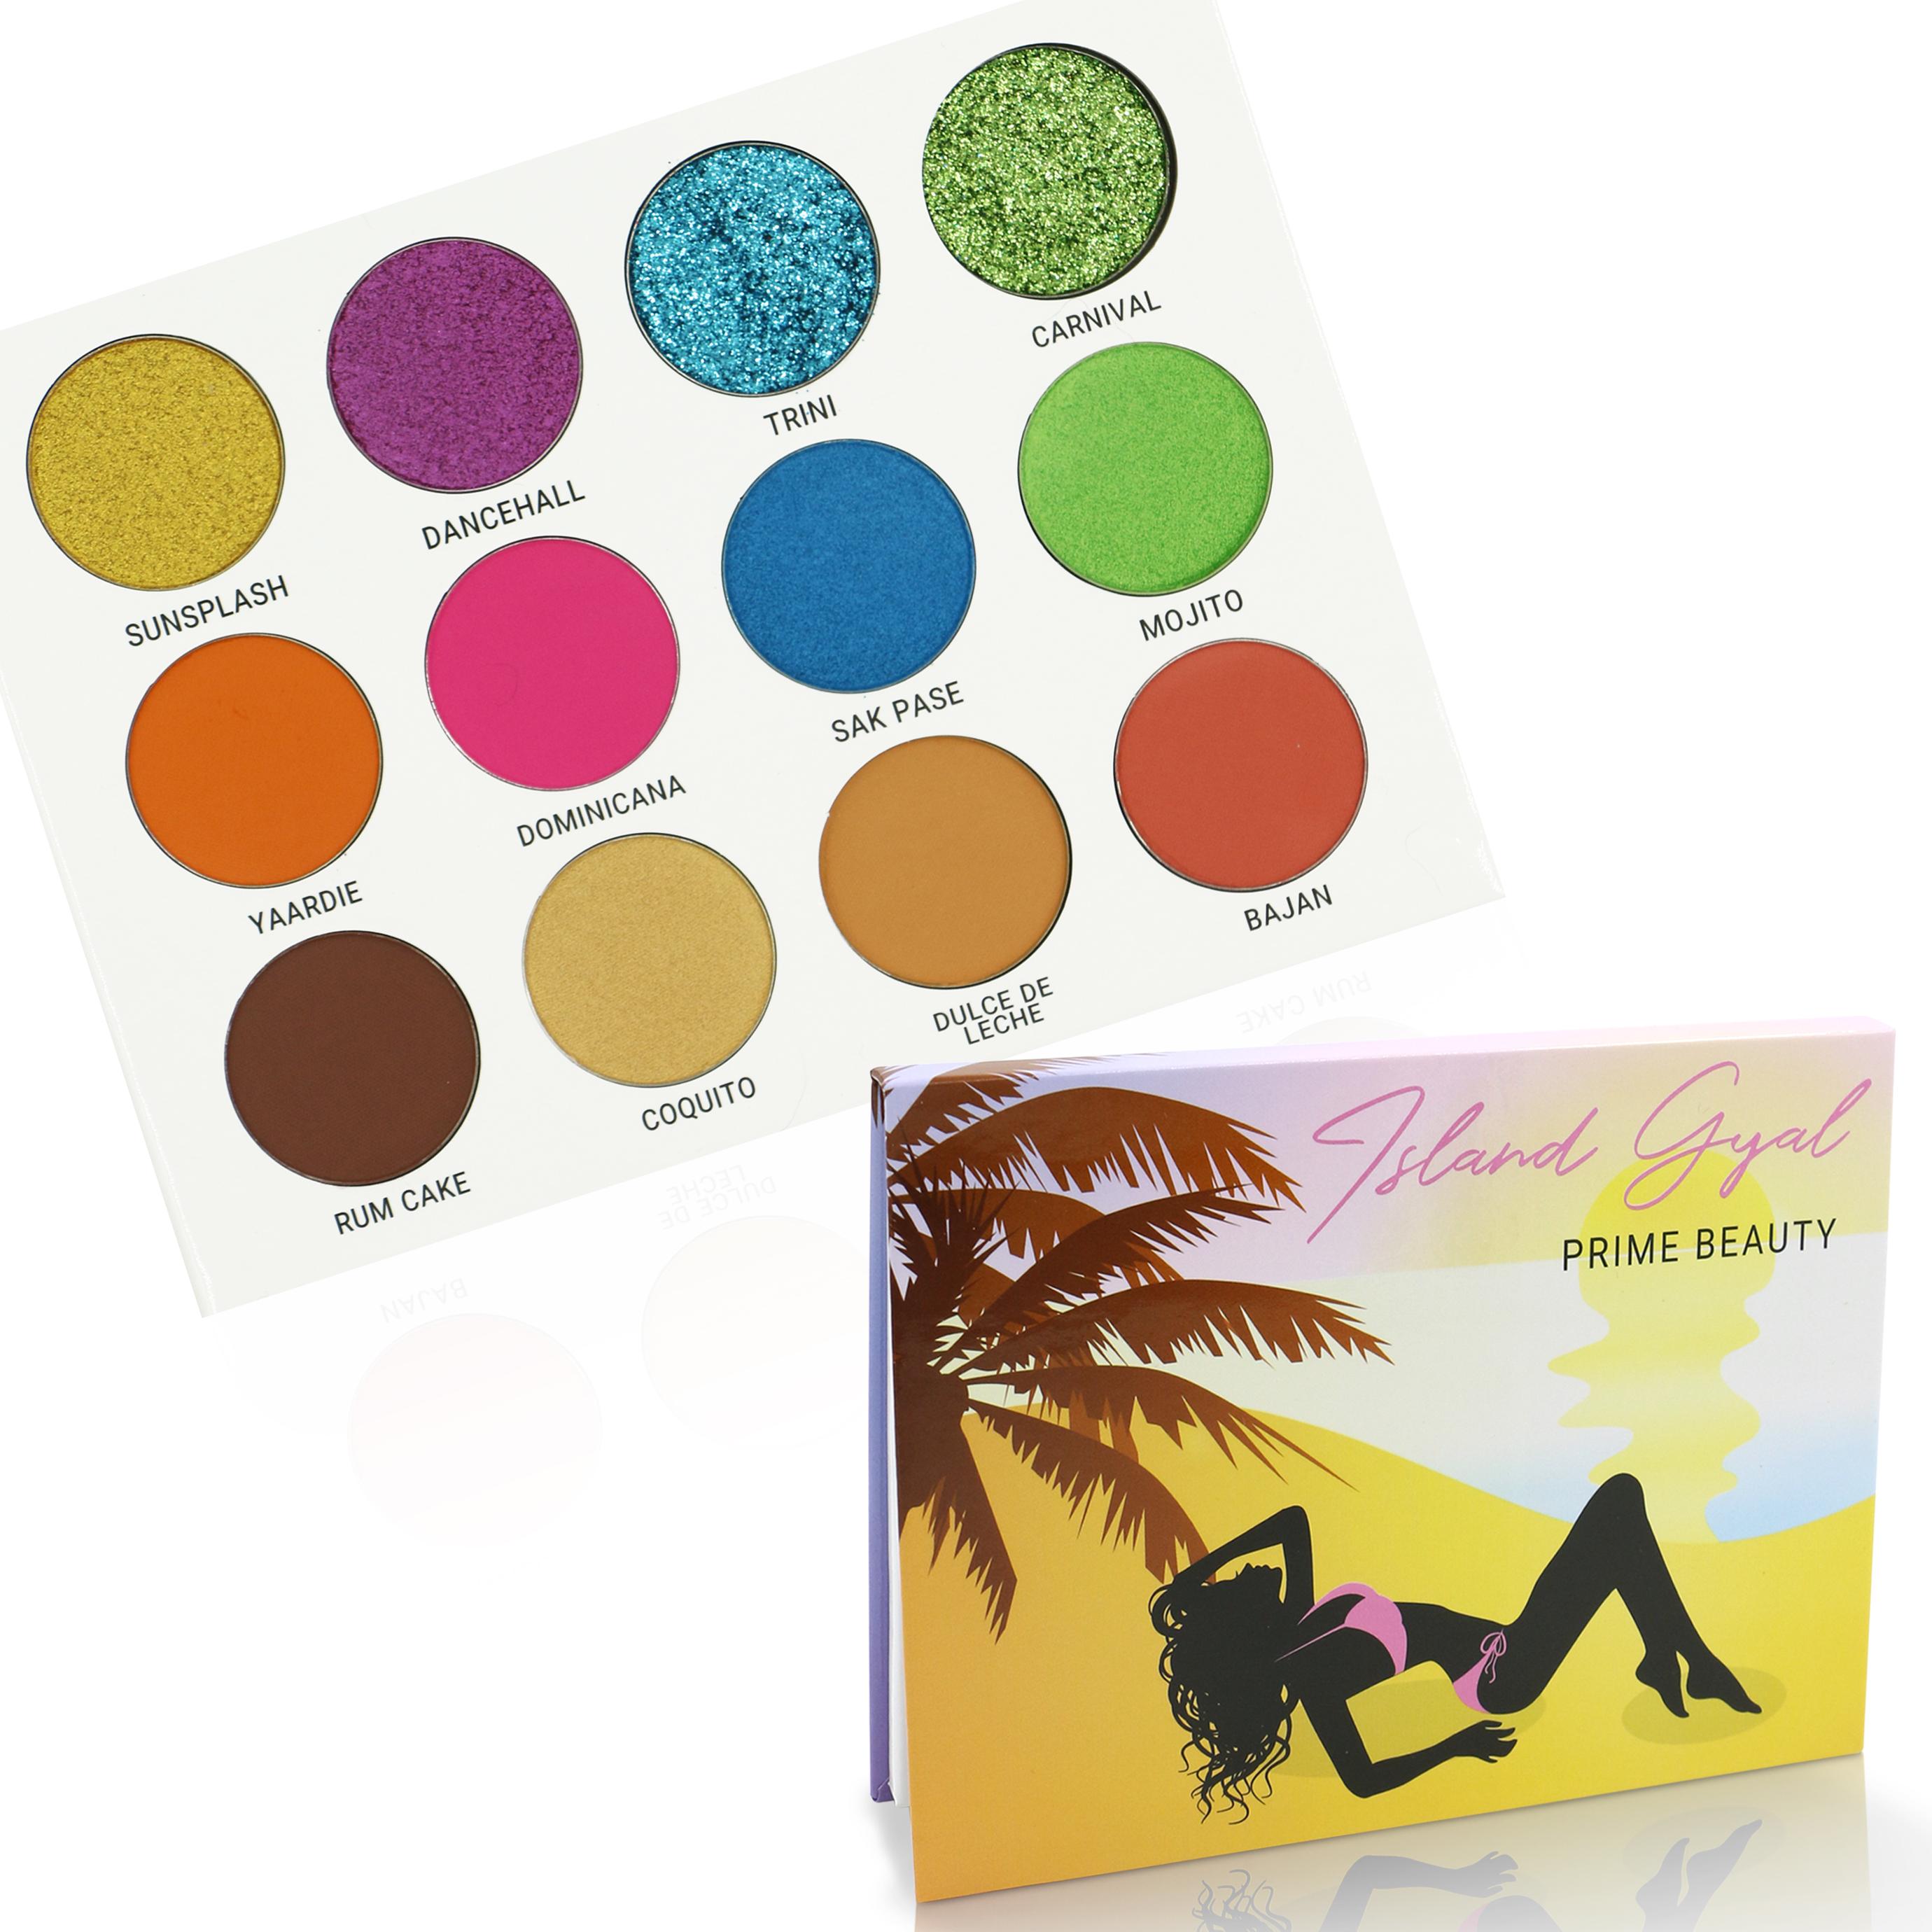 Prime Beauty Cosmetics Island Gal Eyeshadow Palette